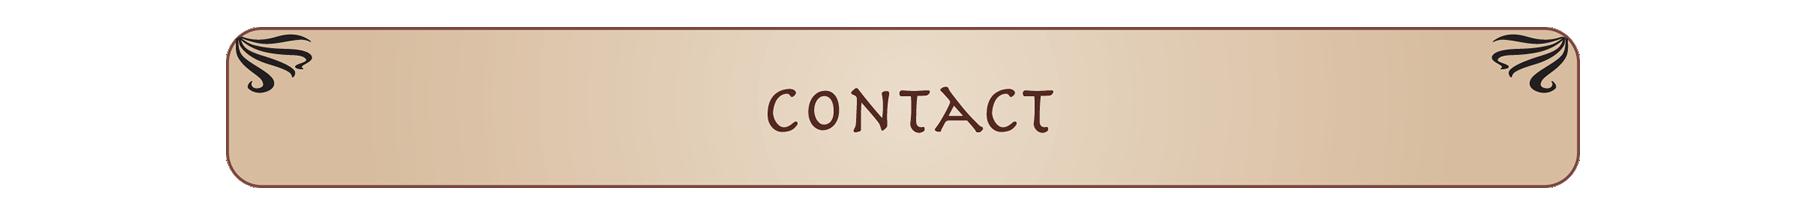 contact-1a